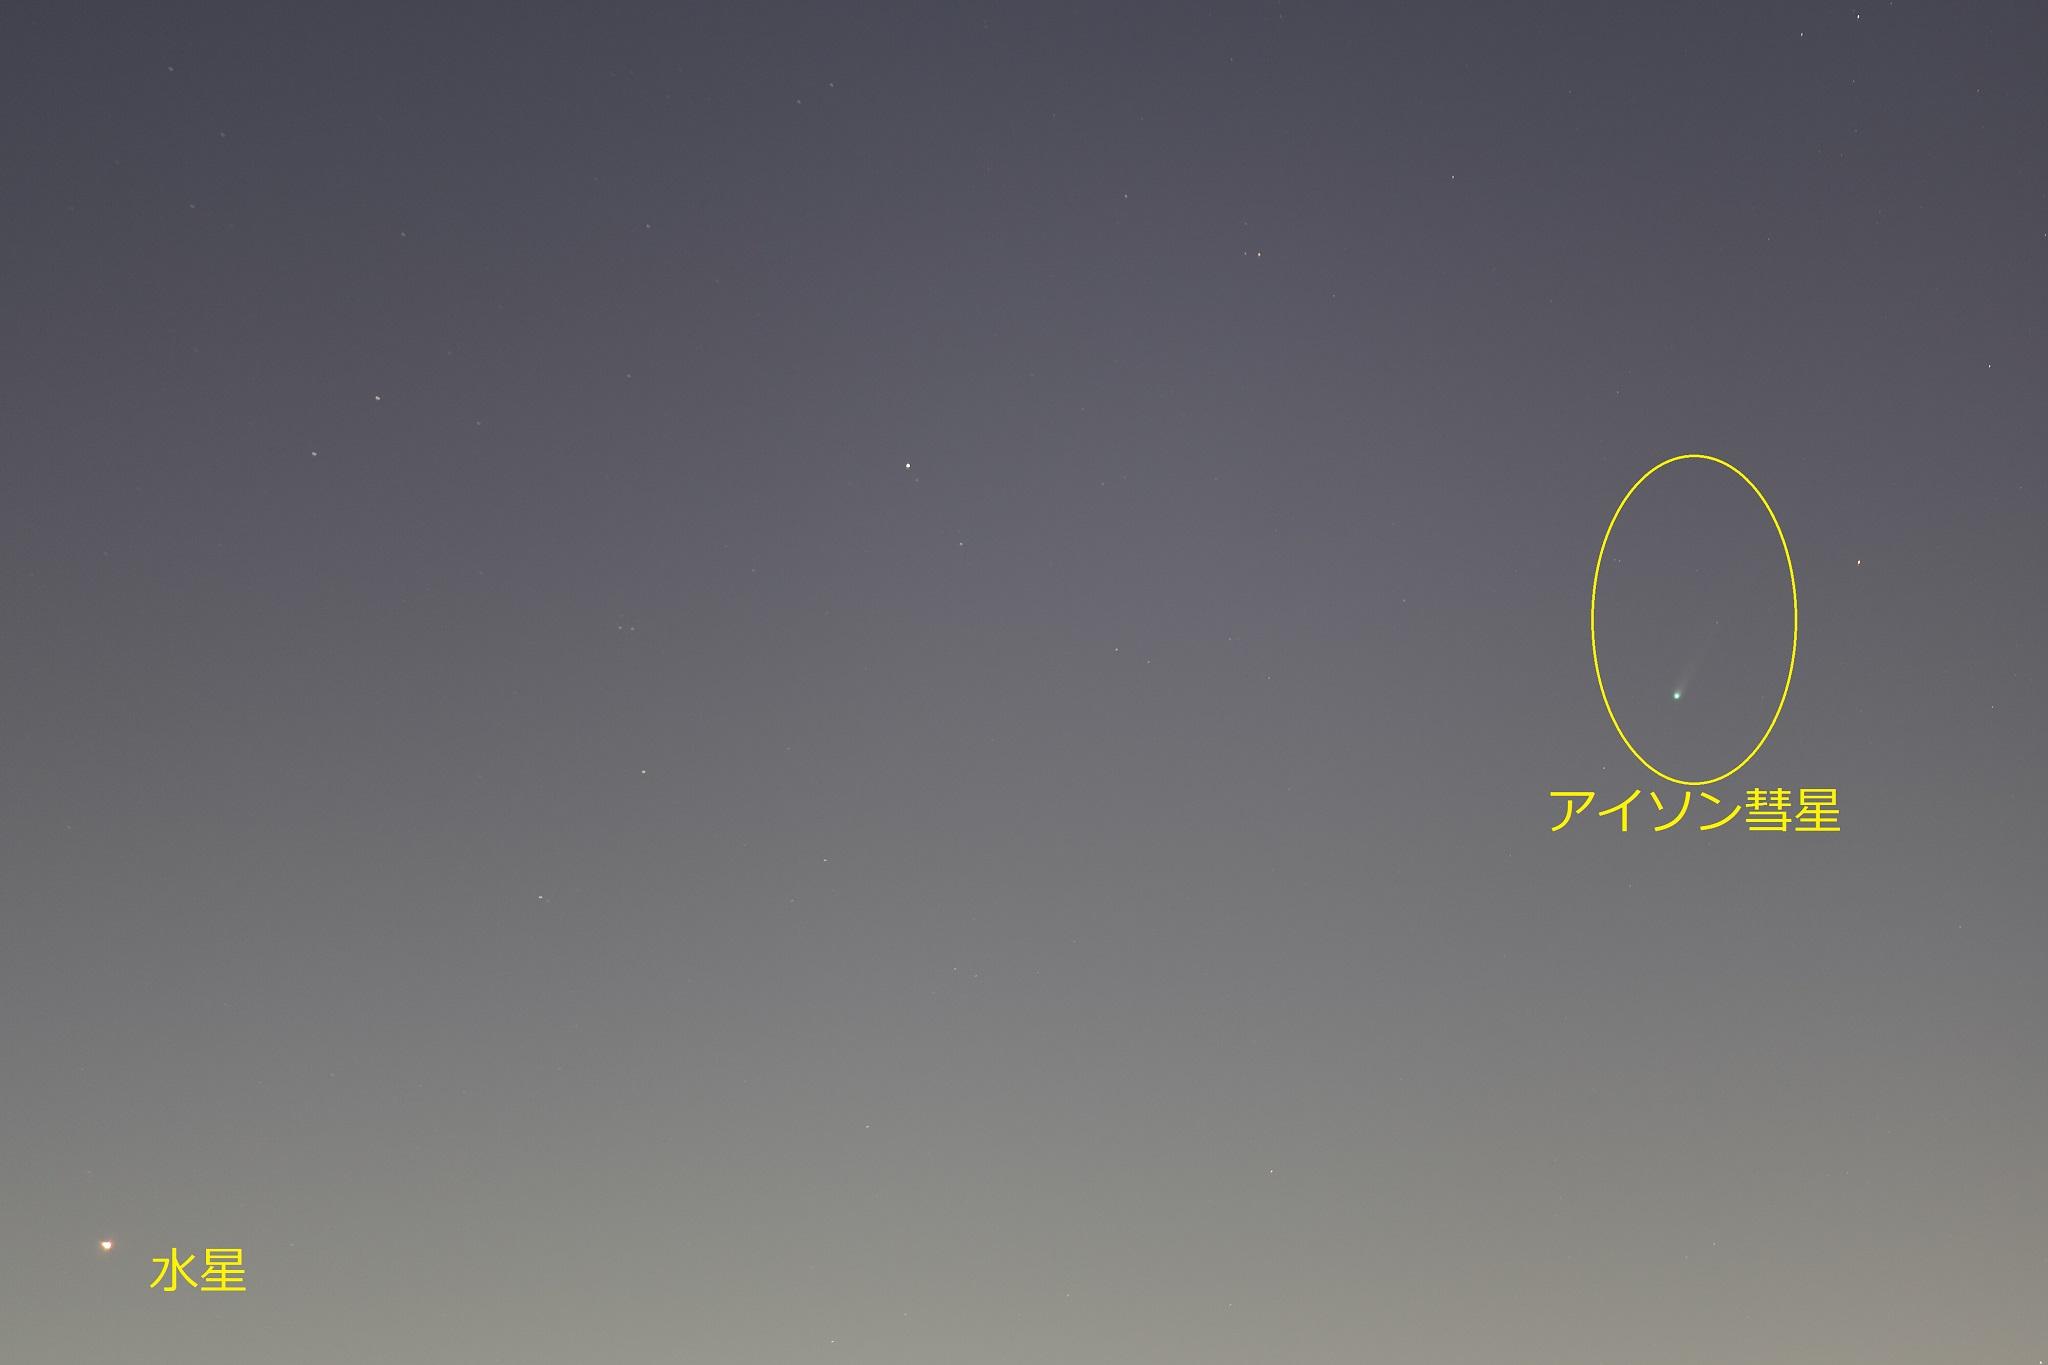 a0219140_20180203.jpg